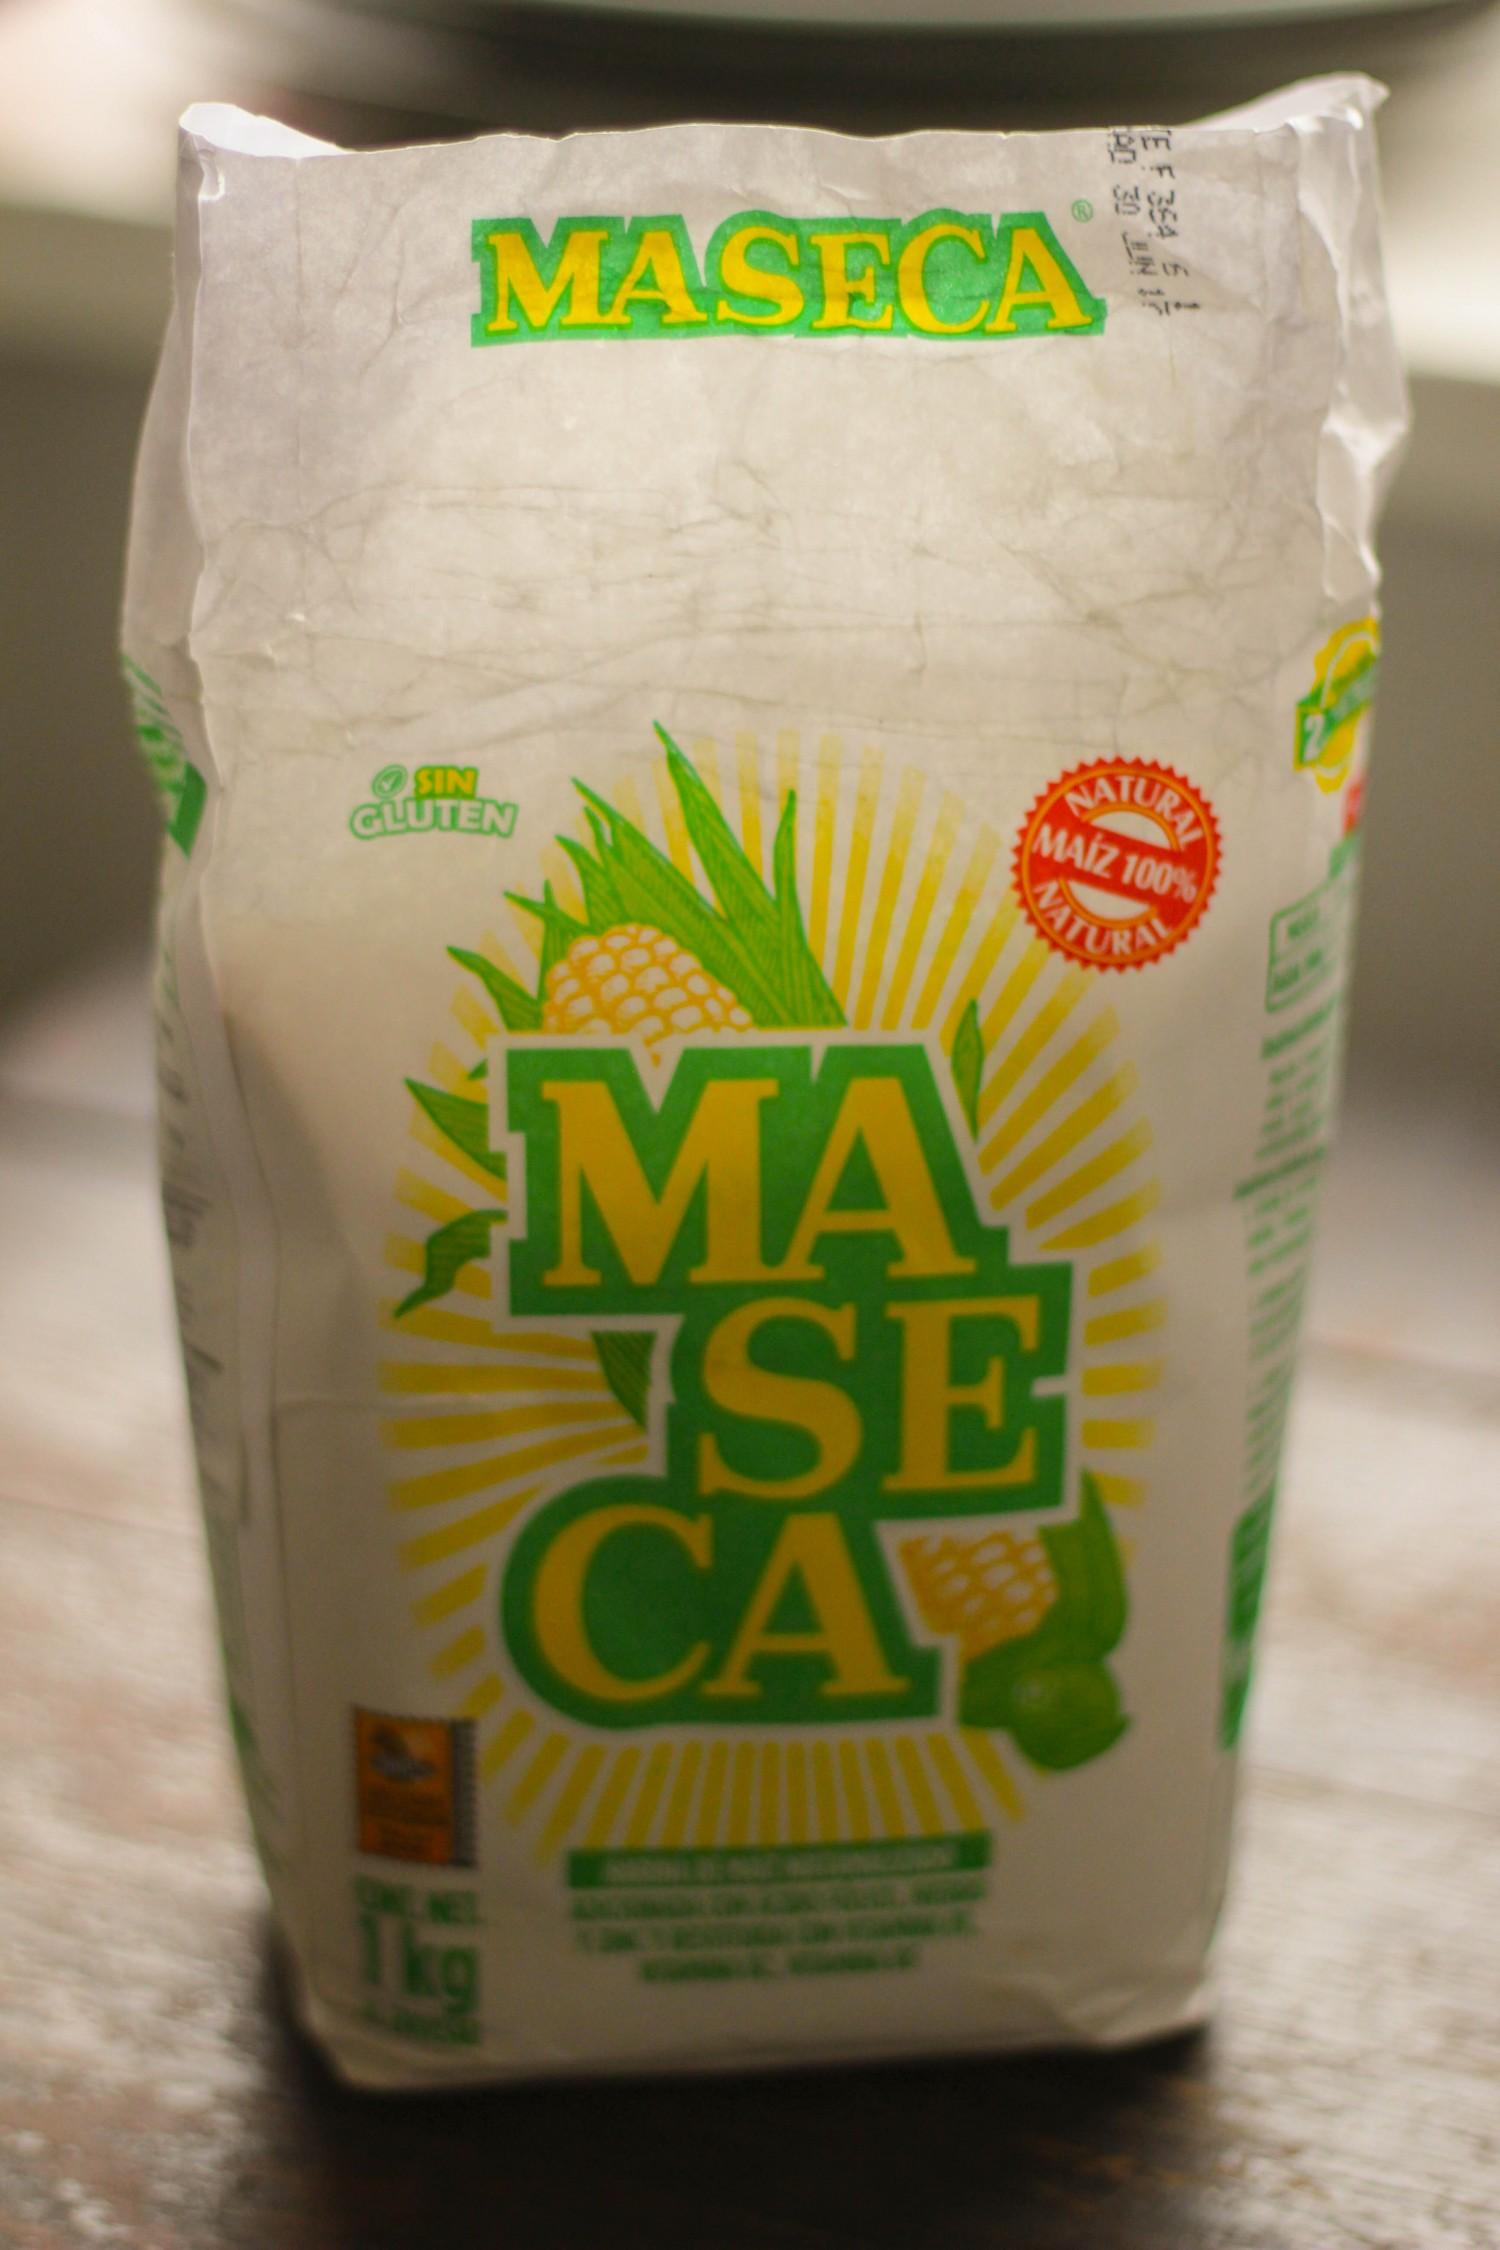 Masa Harina - perfekt til tortilla